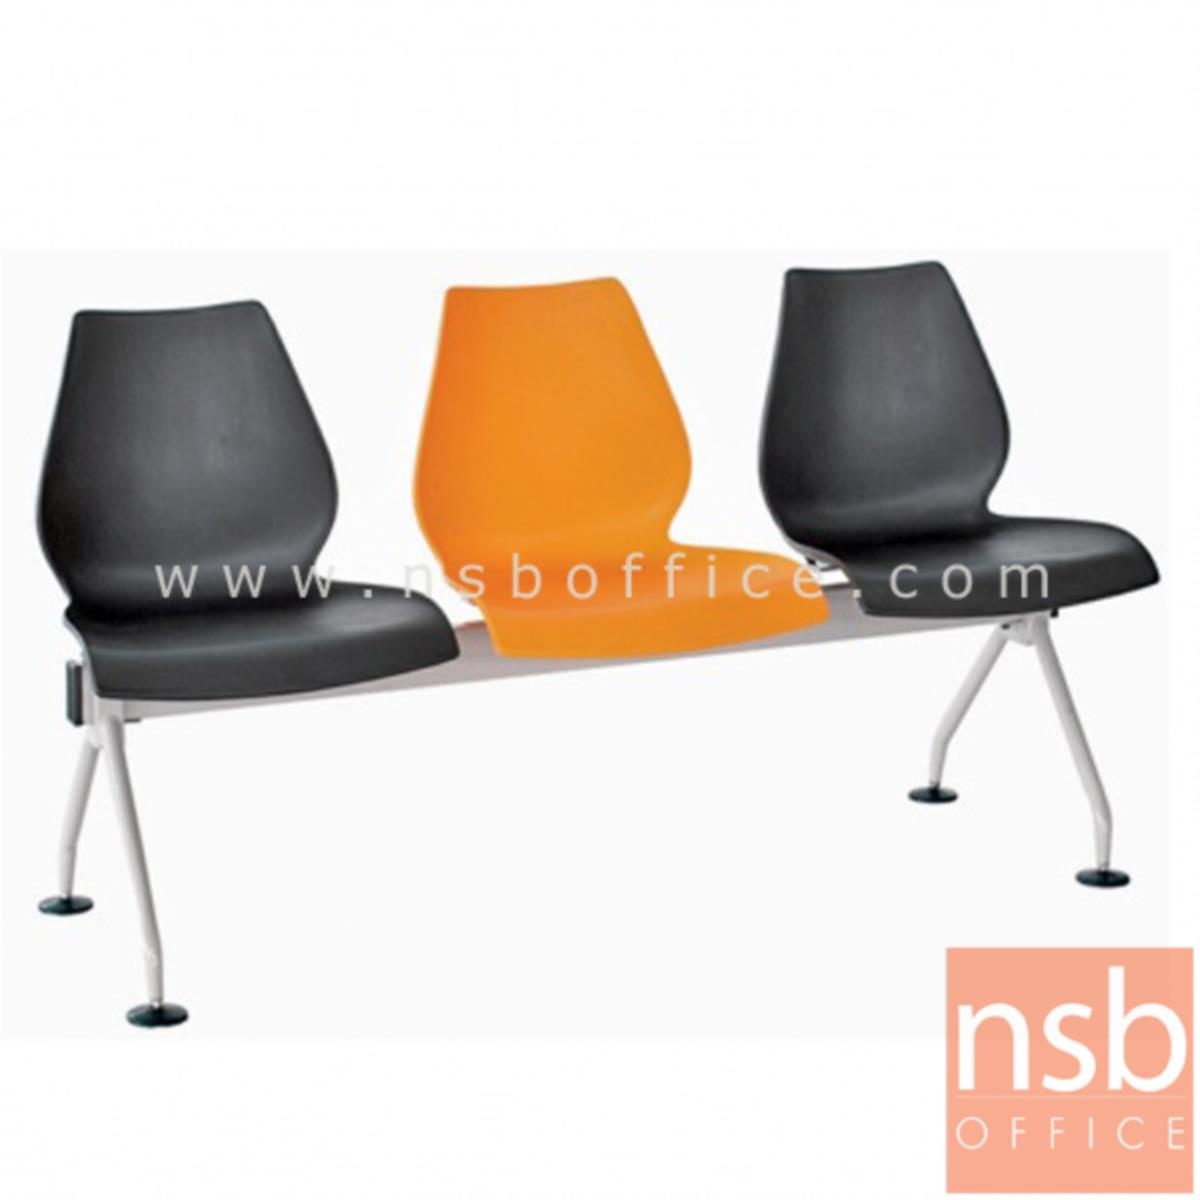 B06A068:เก้าอี้นั่งคอยเฟรมโพลี่ทรงดอกบัว รุ่น B508 2 ,3 ,4 ที่นั่ง ขนาด 96W ,147W ,199W cm. ขาเหล็ก